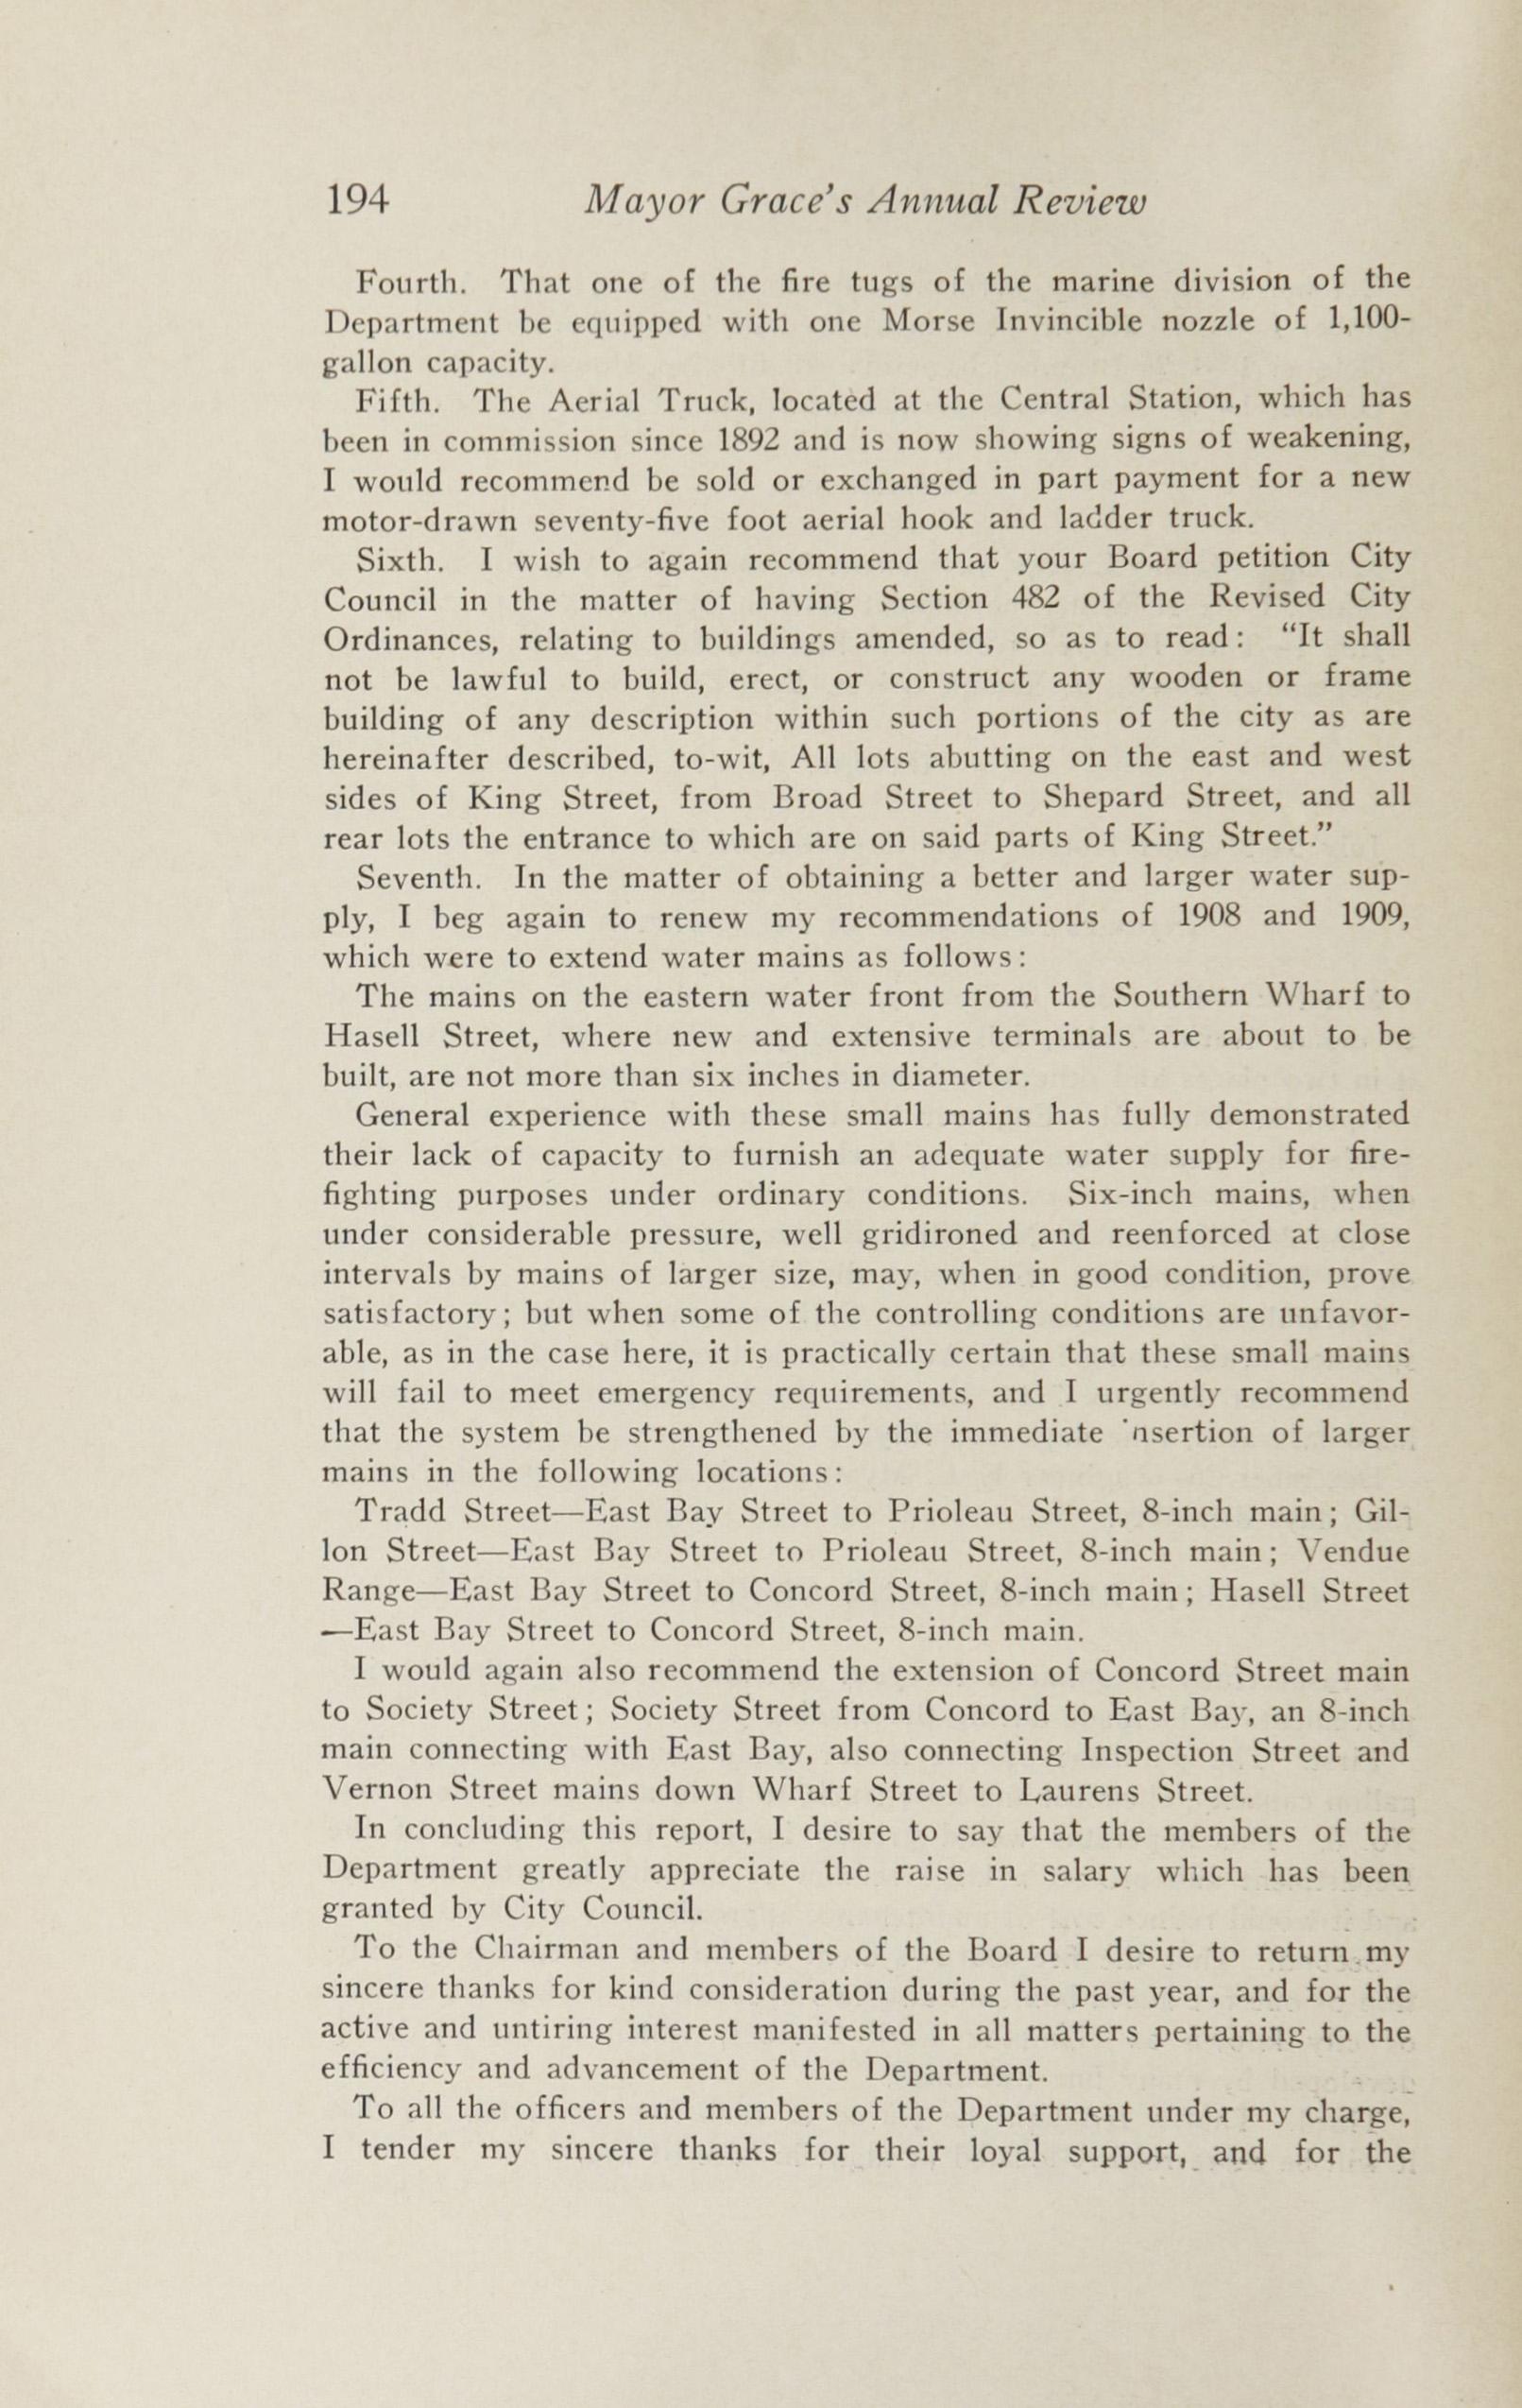 Charleston Yearbook, 1913, page 194